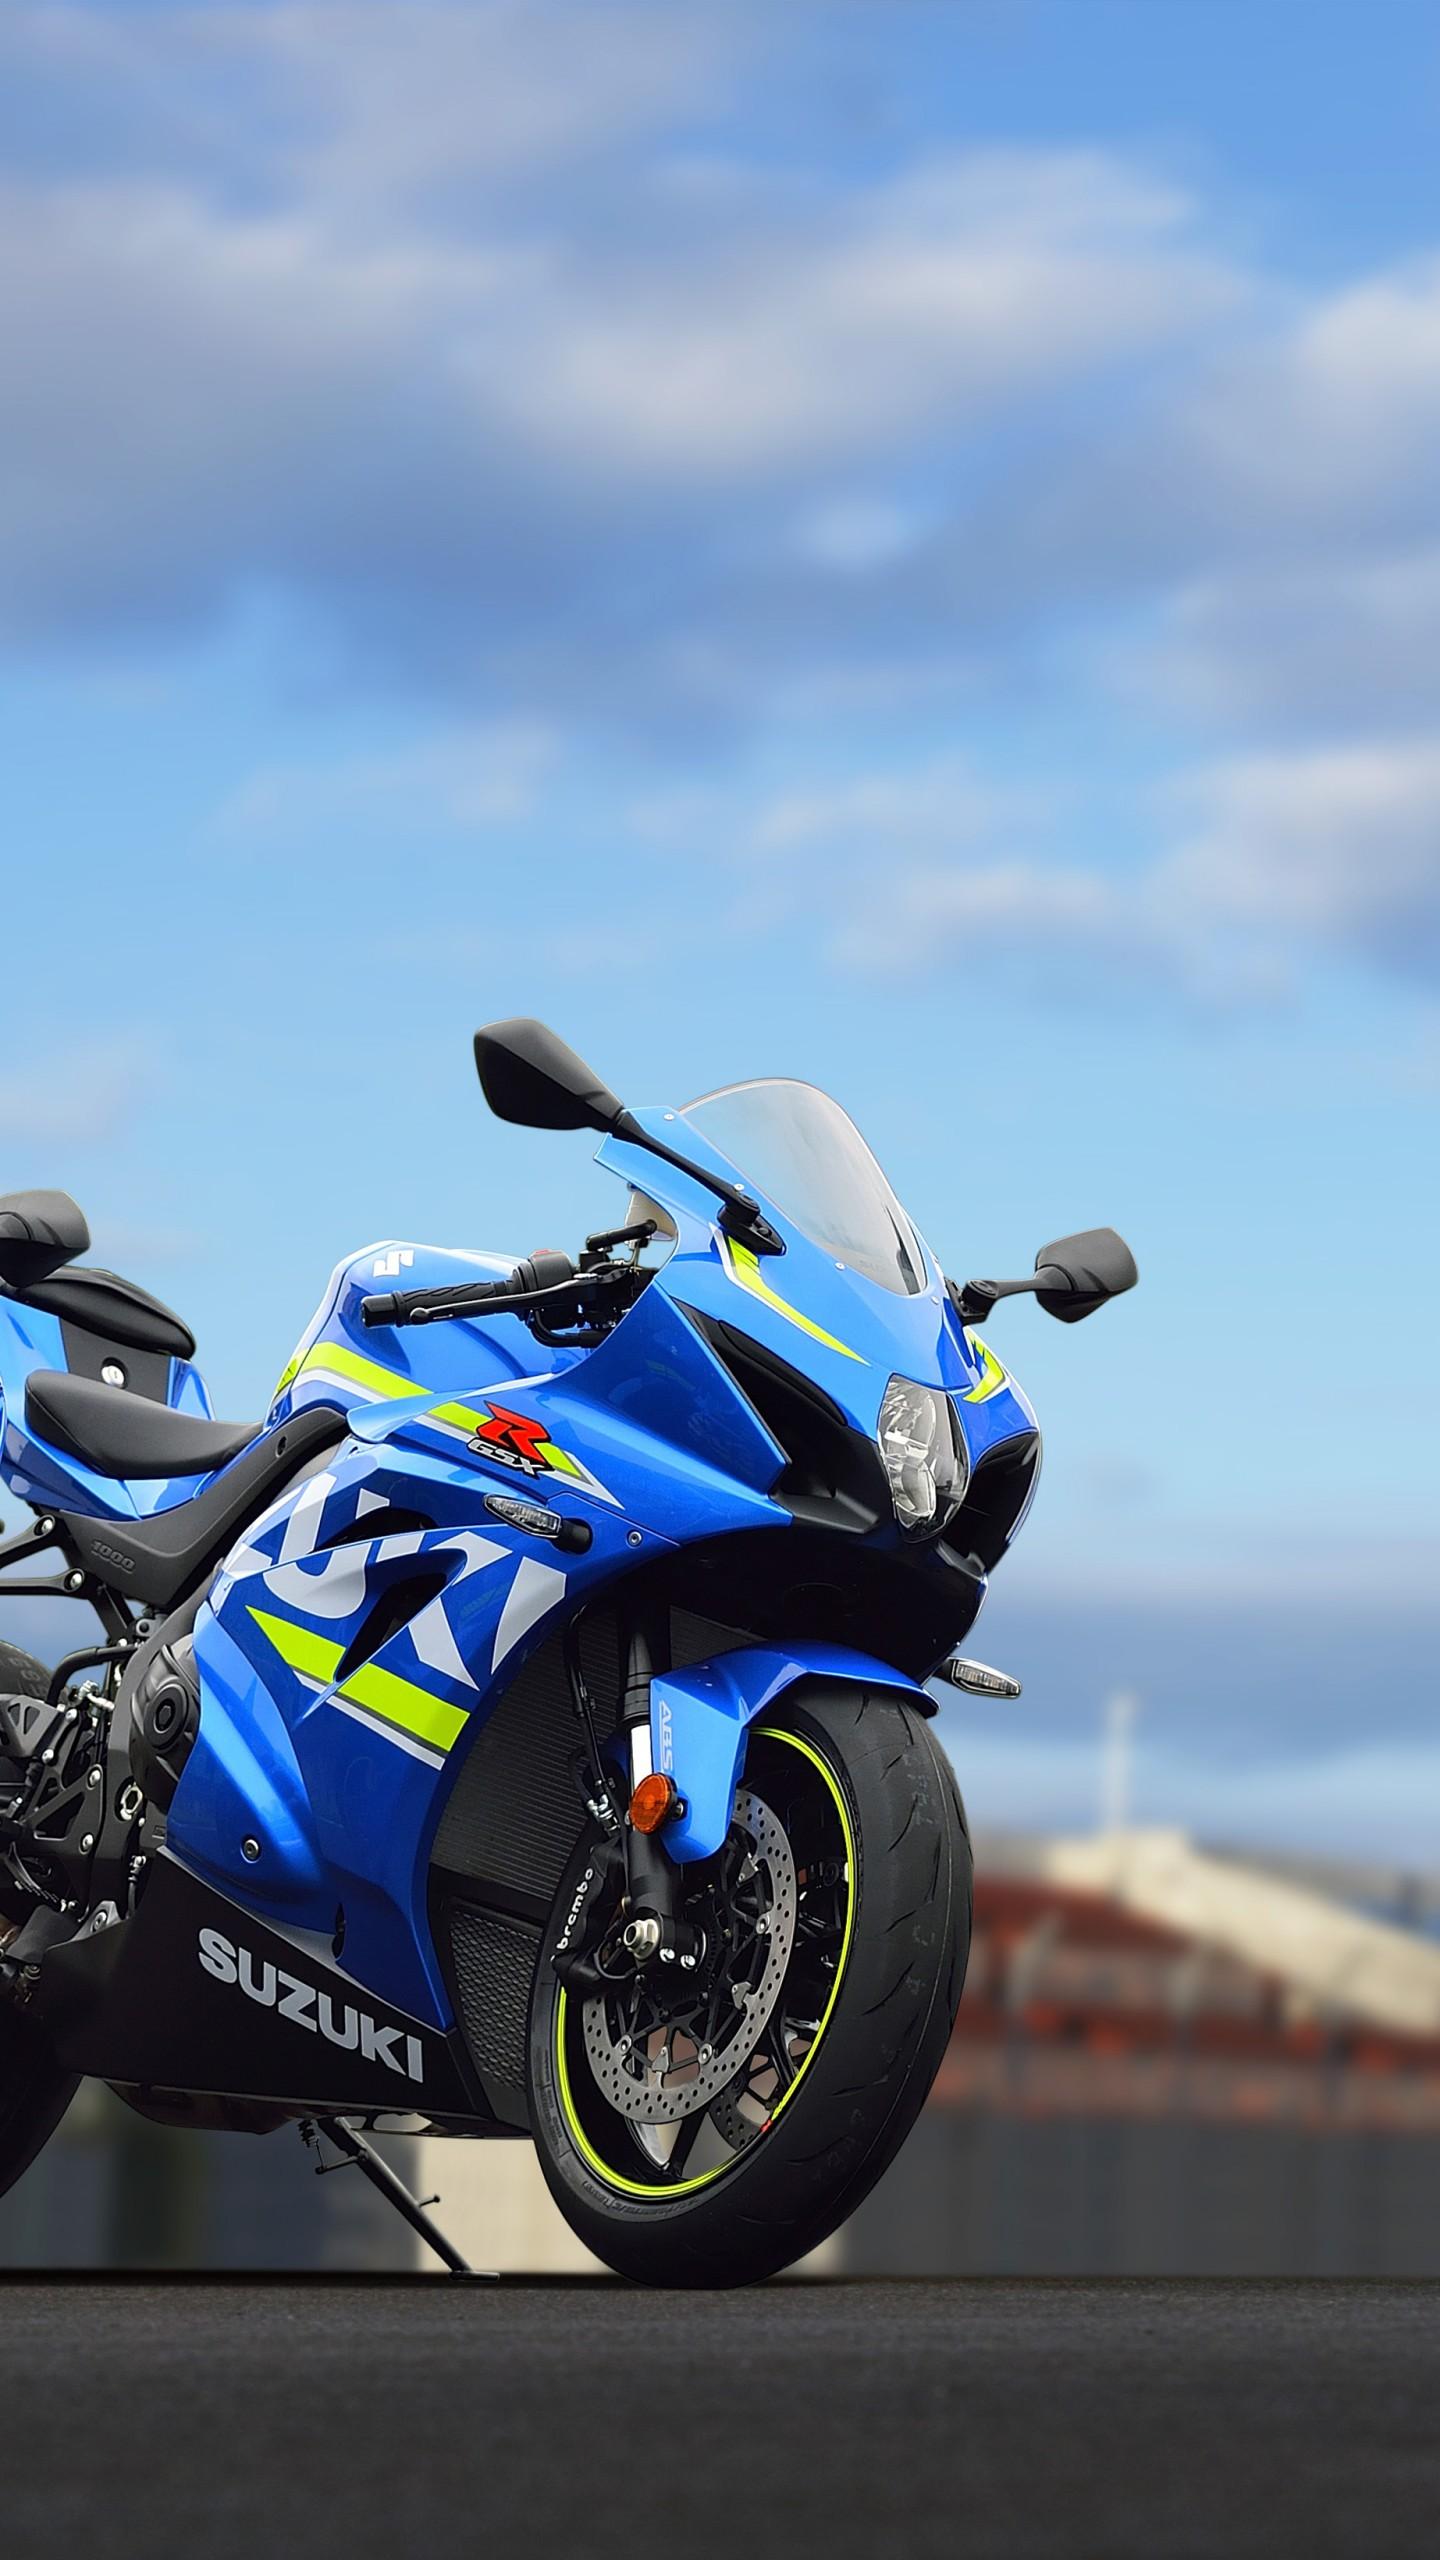 Wallpaper Suzuki Gsx R1000 2017 Bikes 4k Cars Amp Bikes